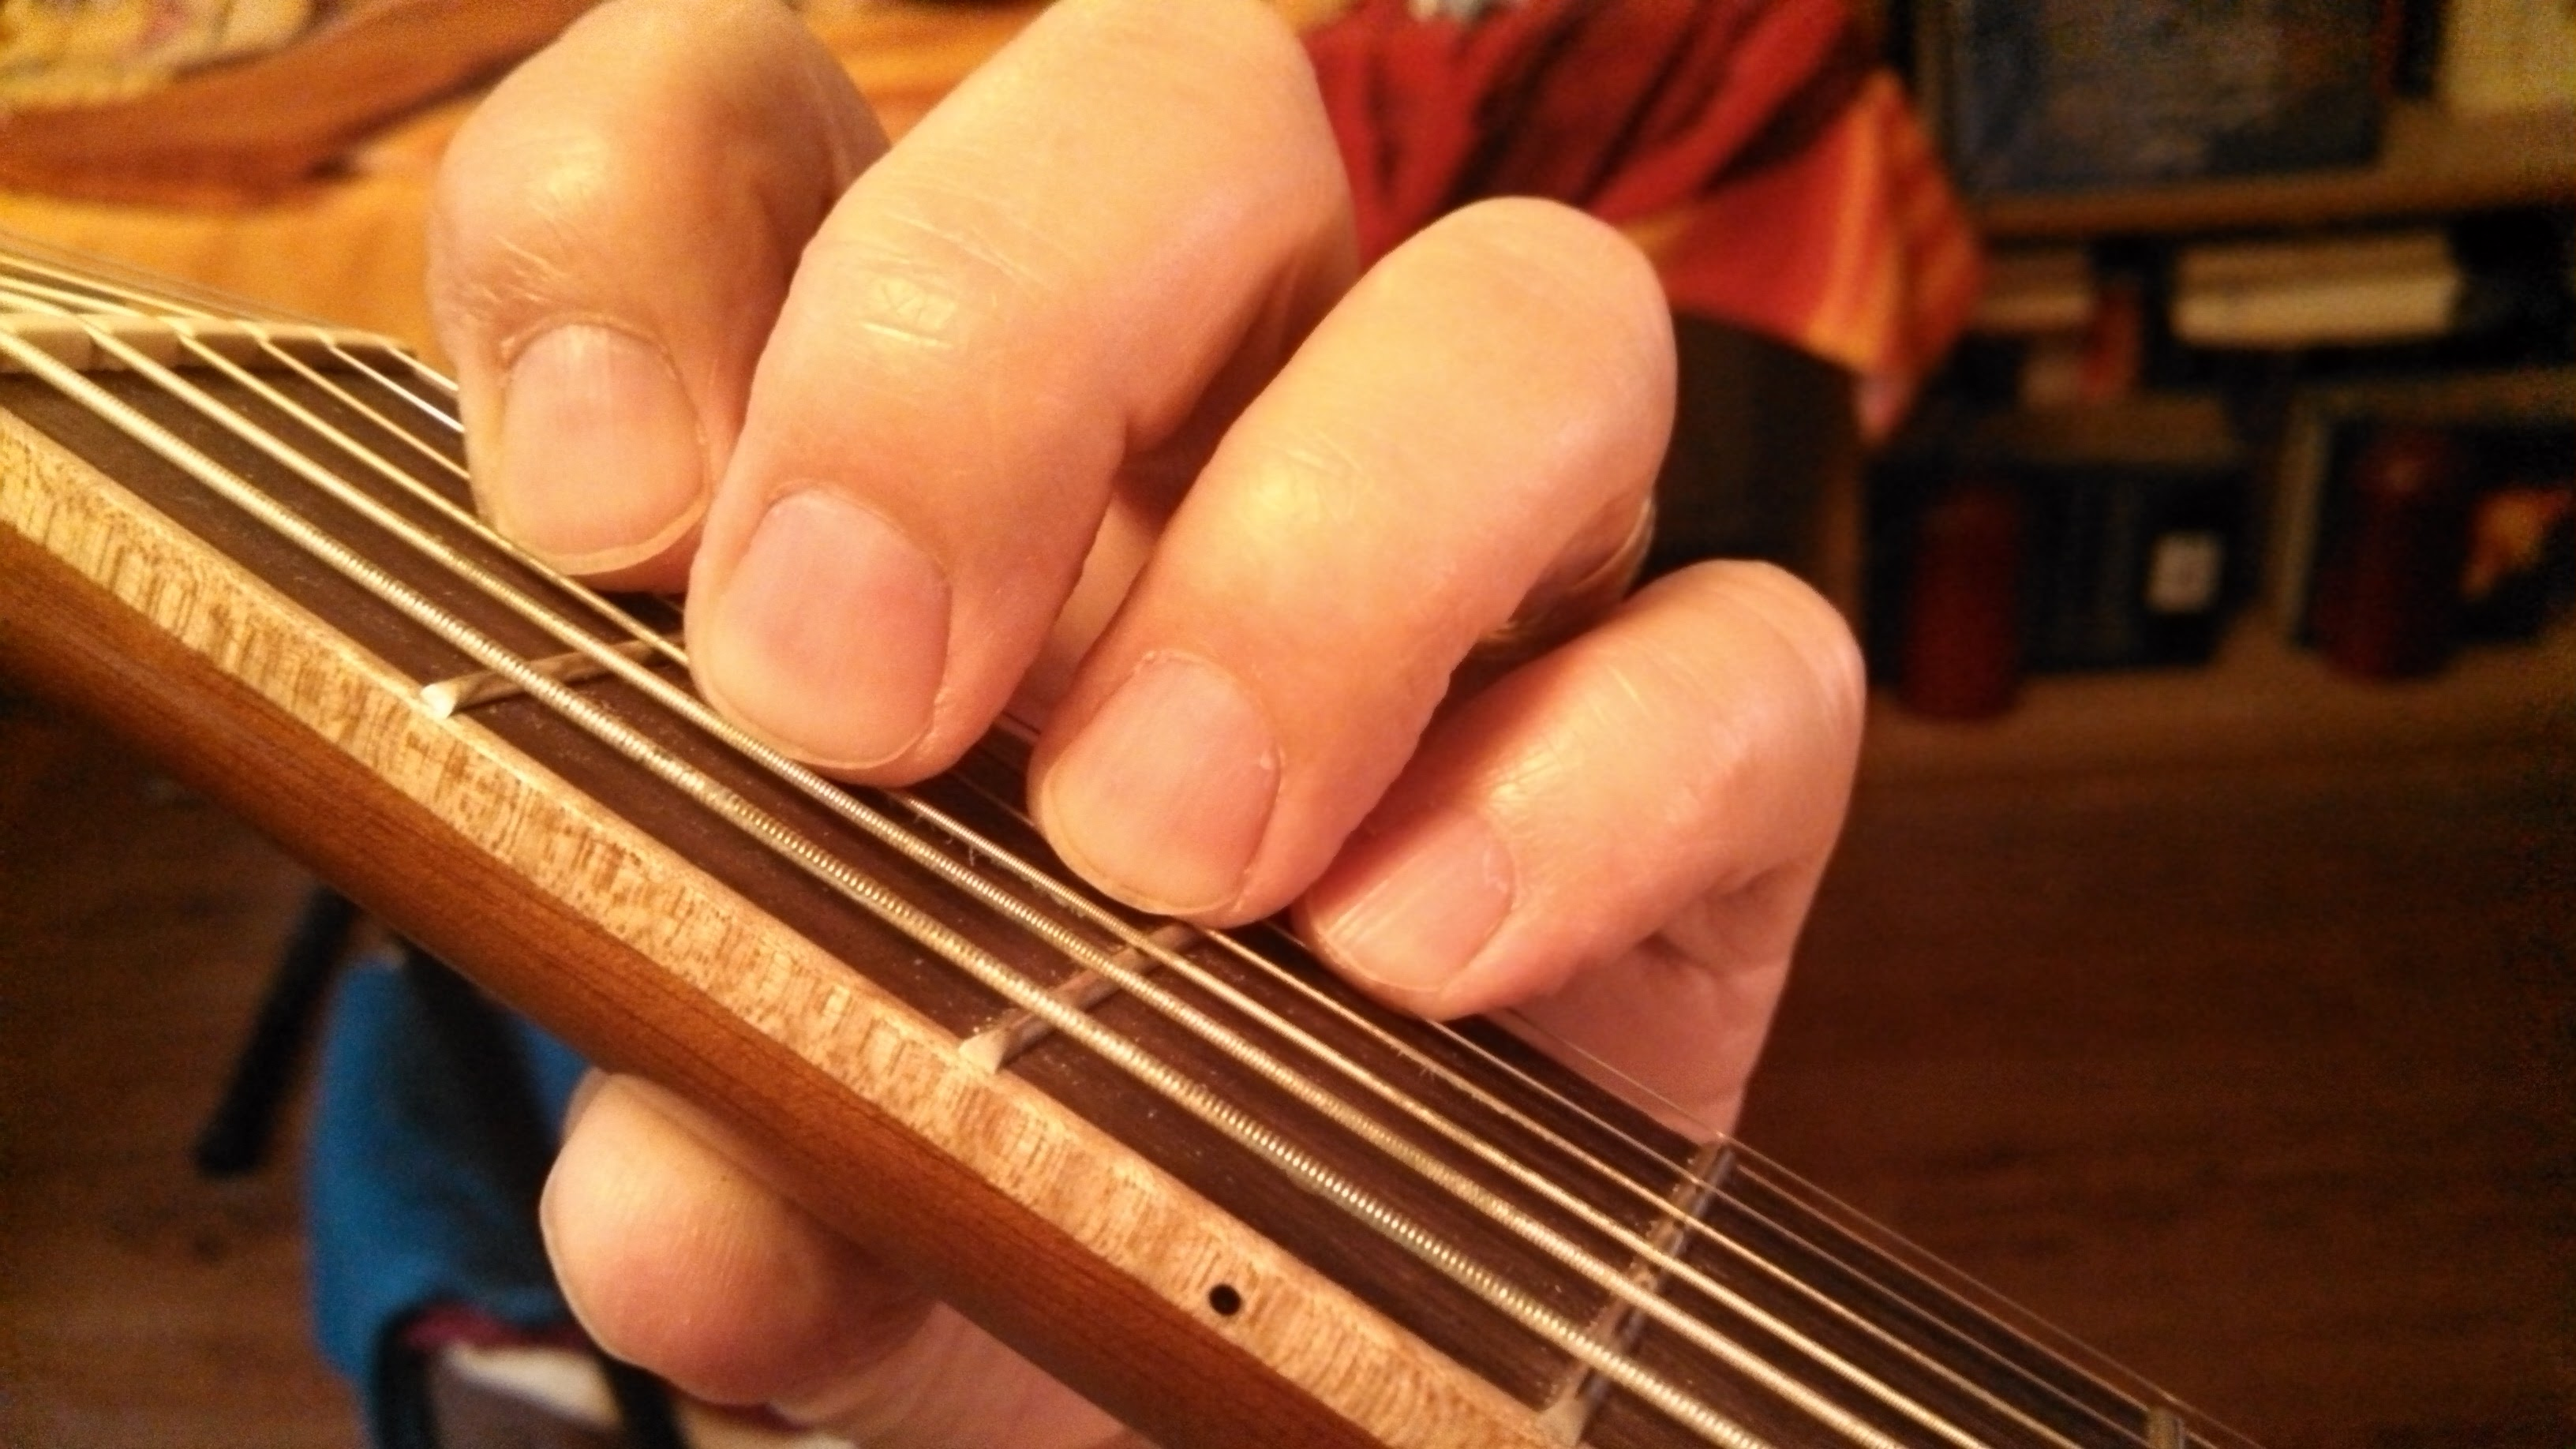 Guitar Fingers Bad_202.jpg